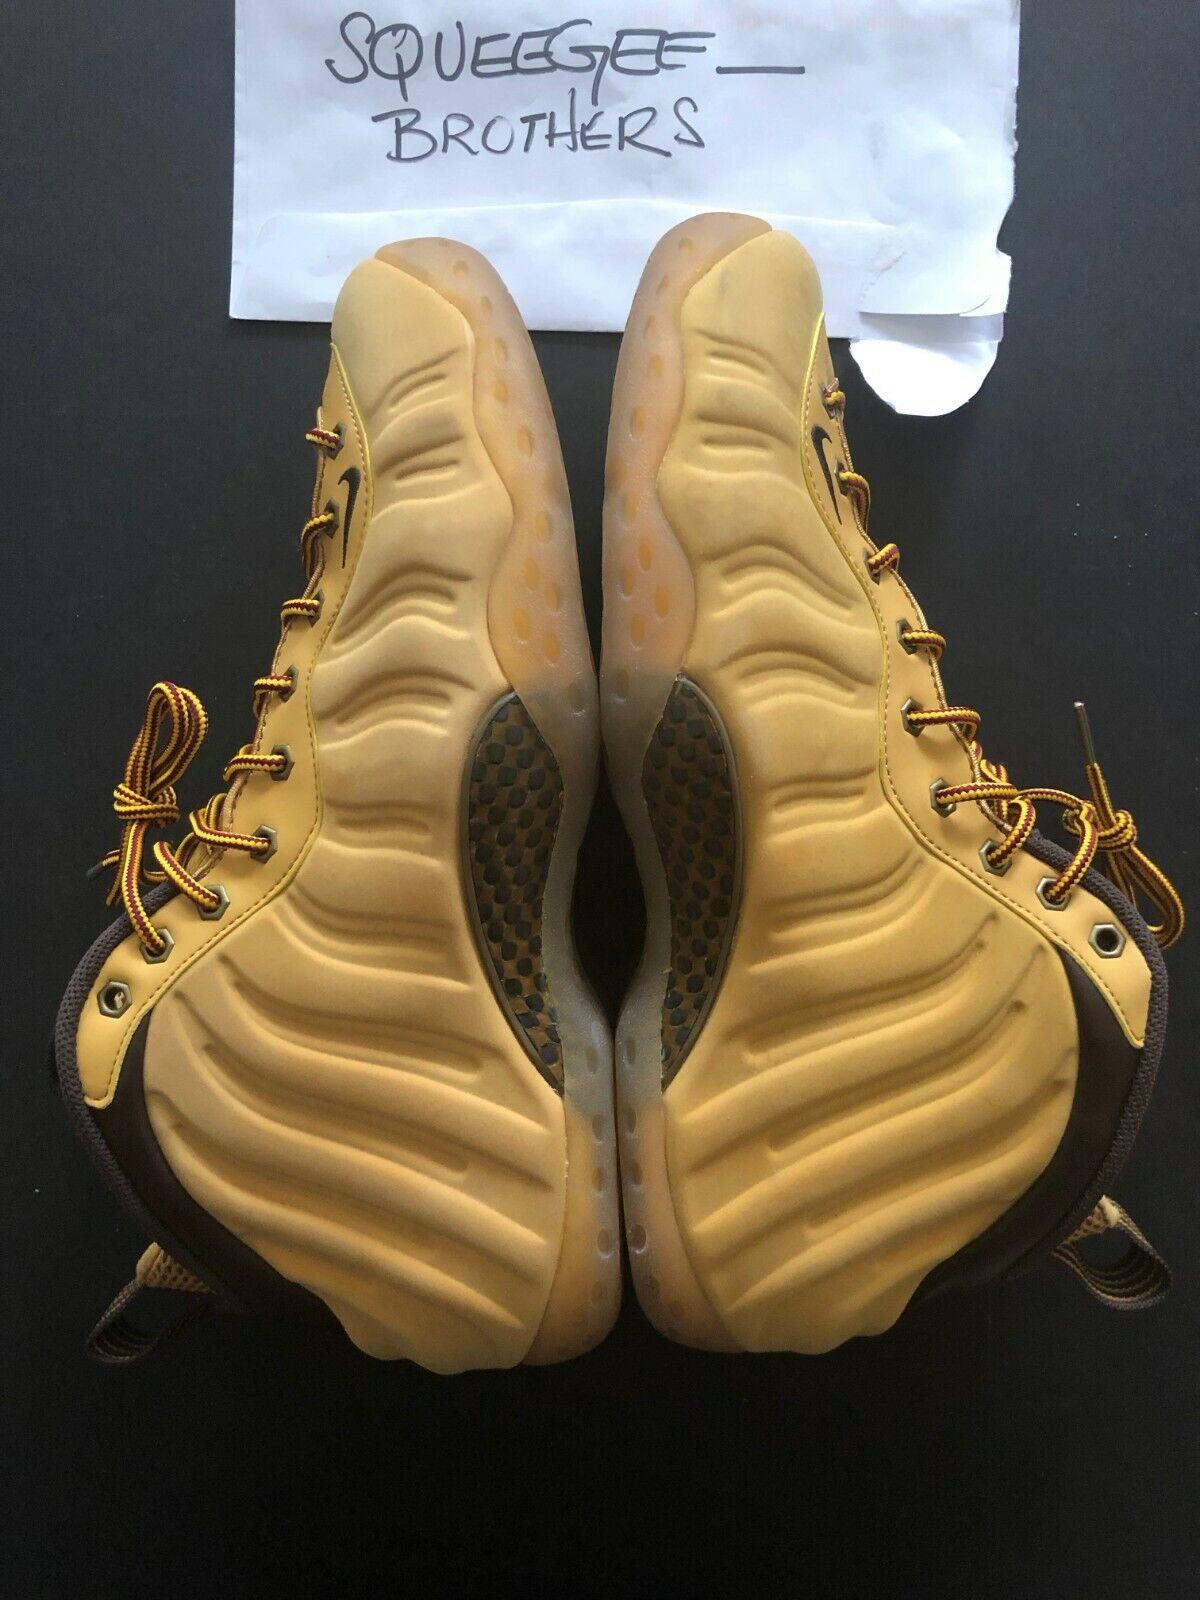 reputable site bbe76 2675f Nike Air Penny Jordan 575420-700 11.5. Size Haystack Wheat ...